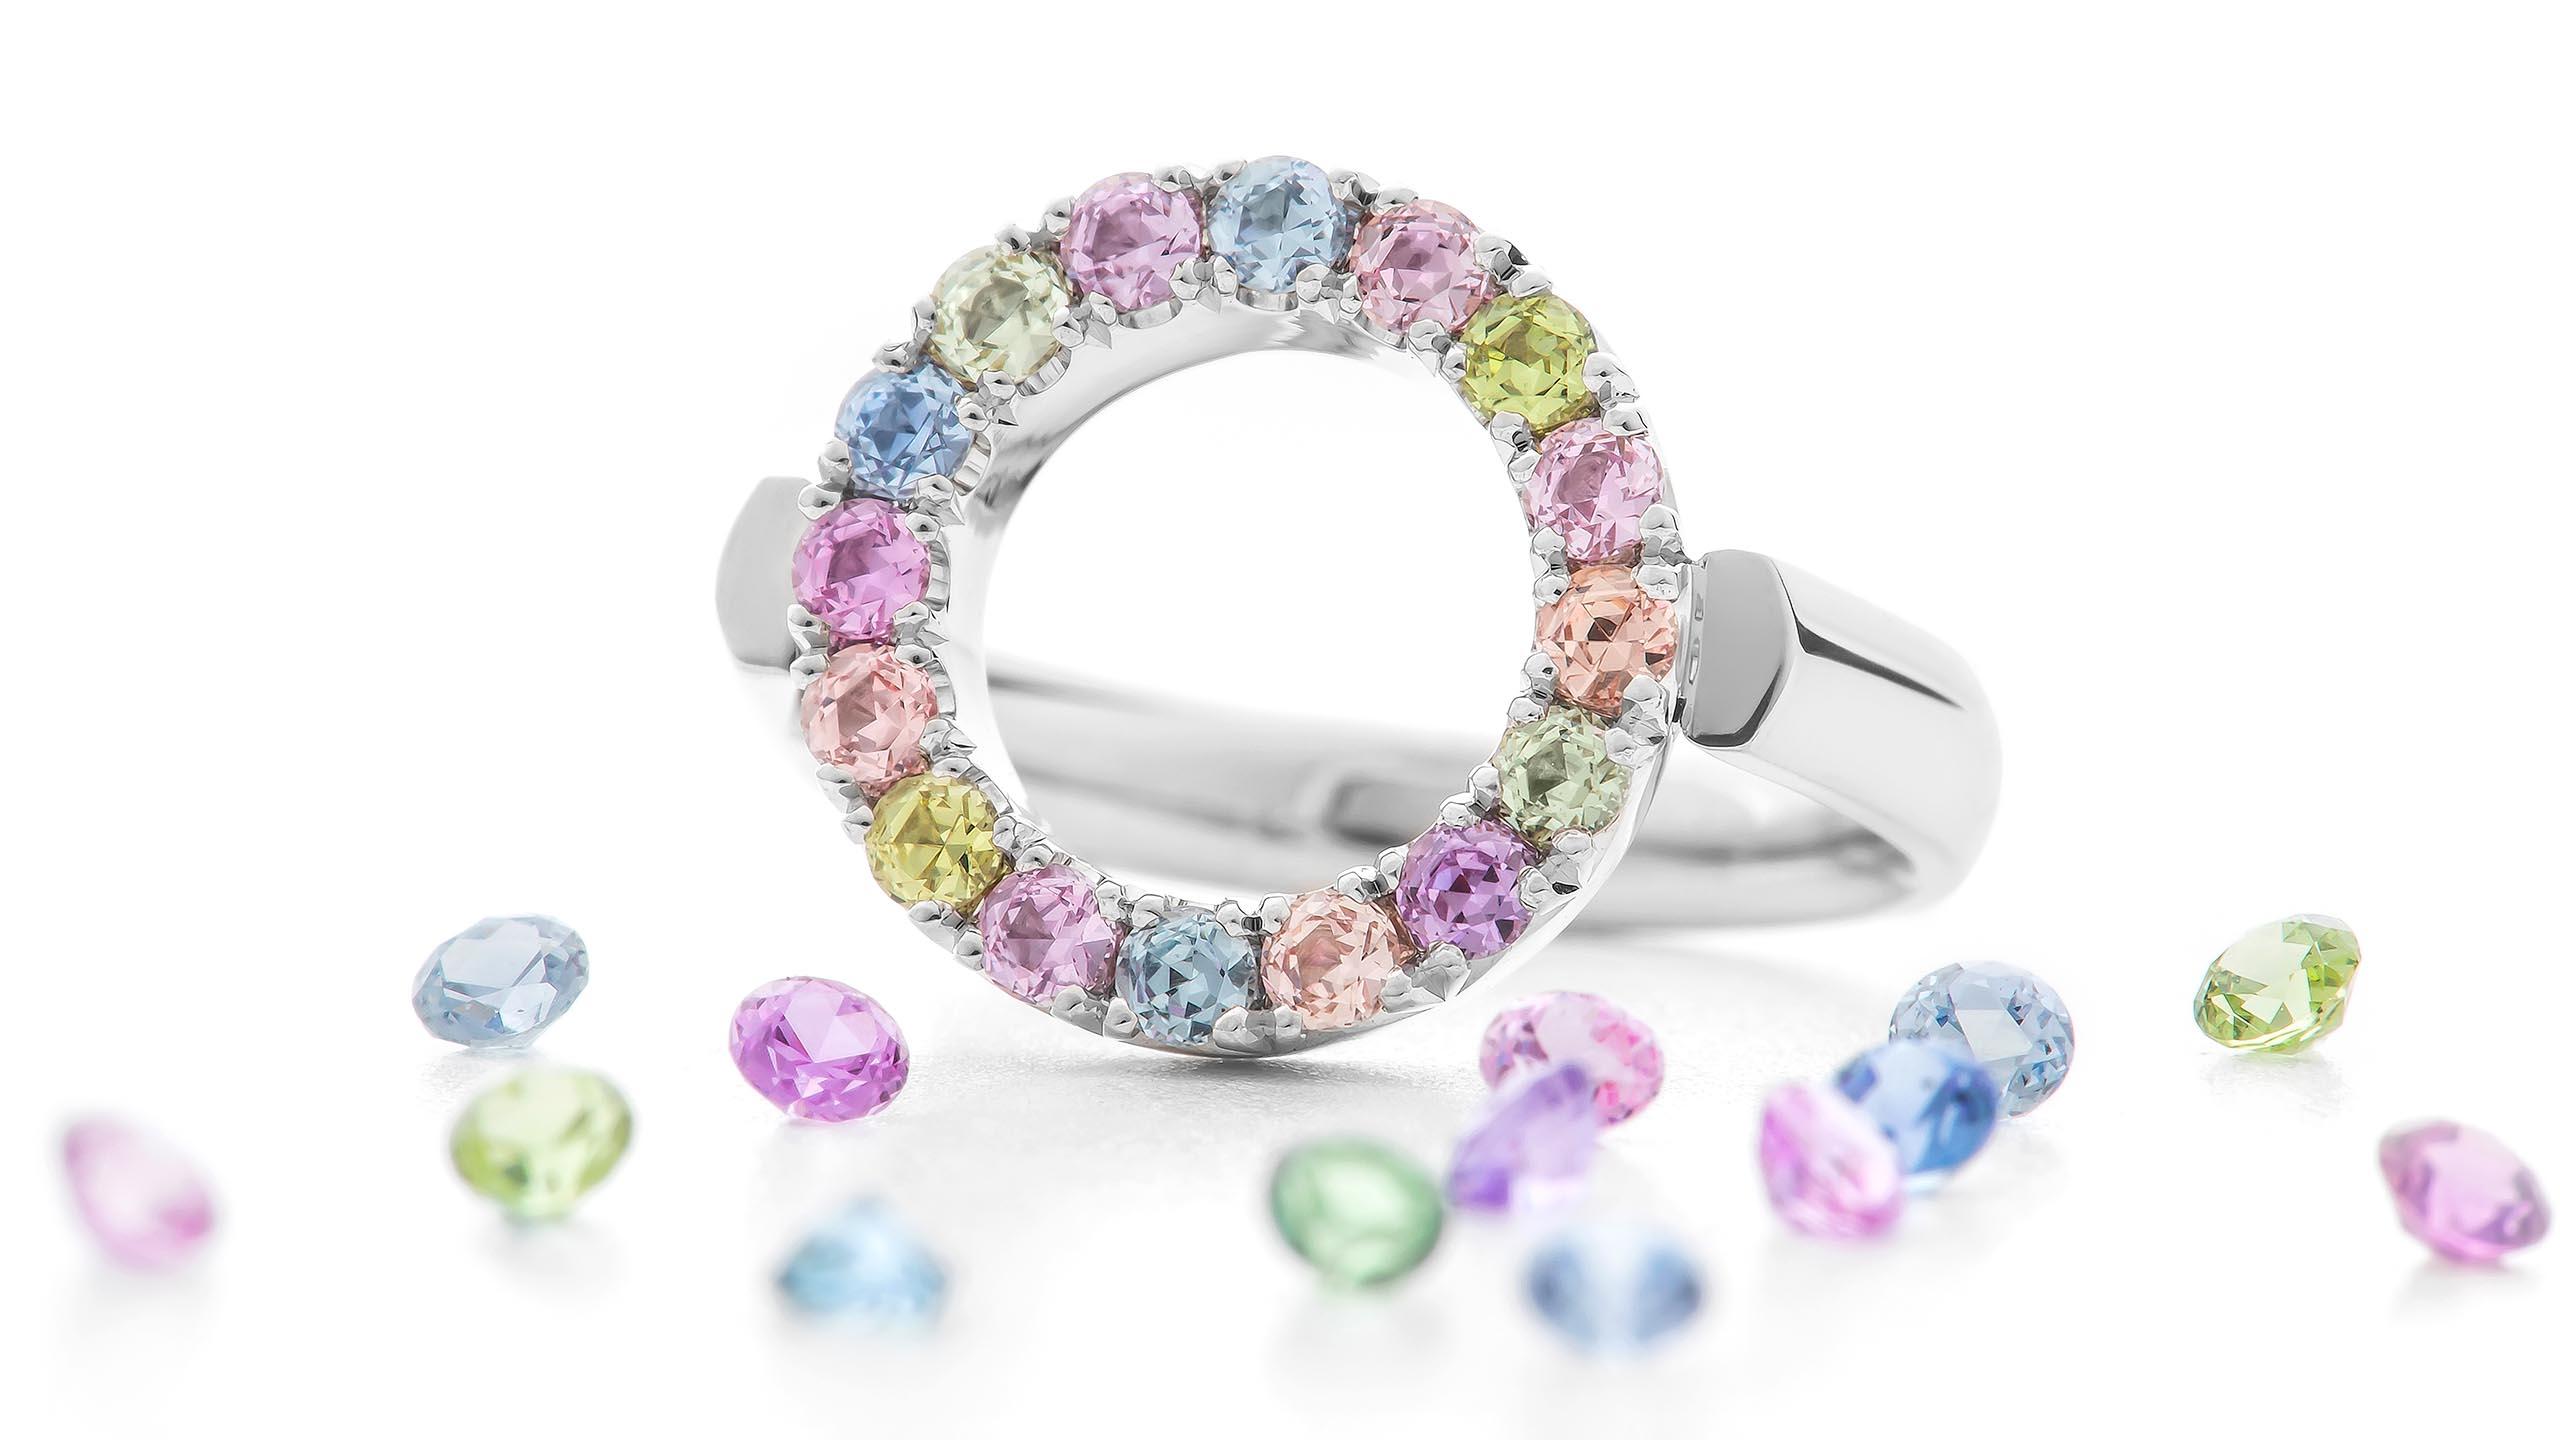 produktova-fotografie-sperk-prsten-drahe-kameny-esterstyl